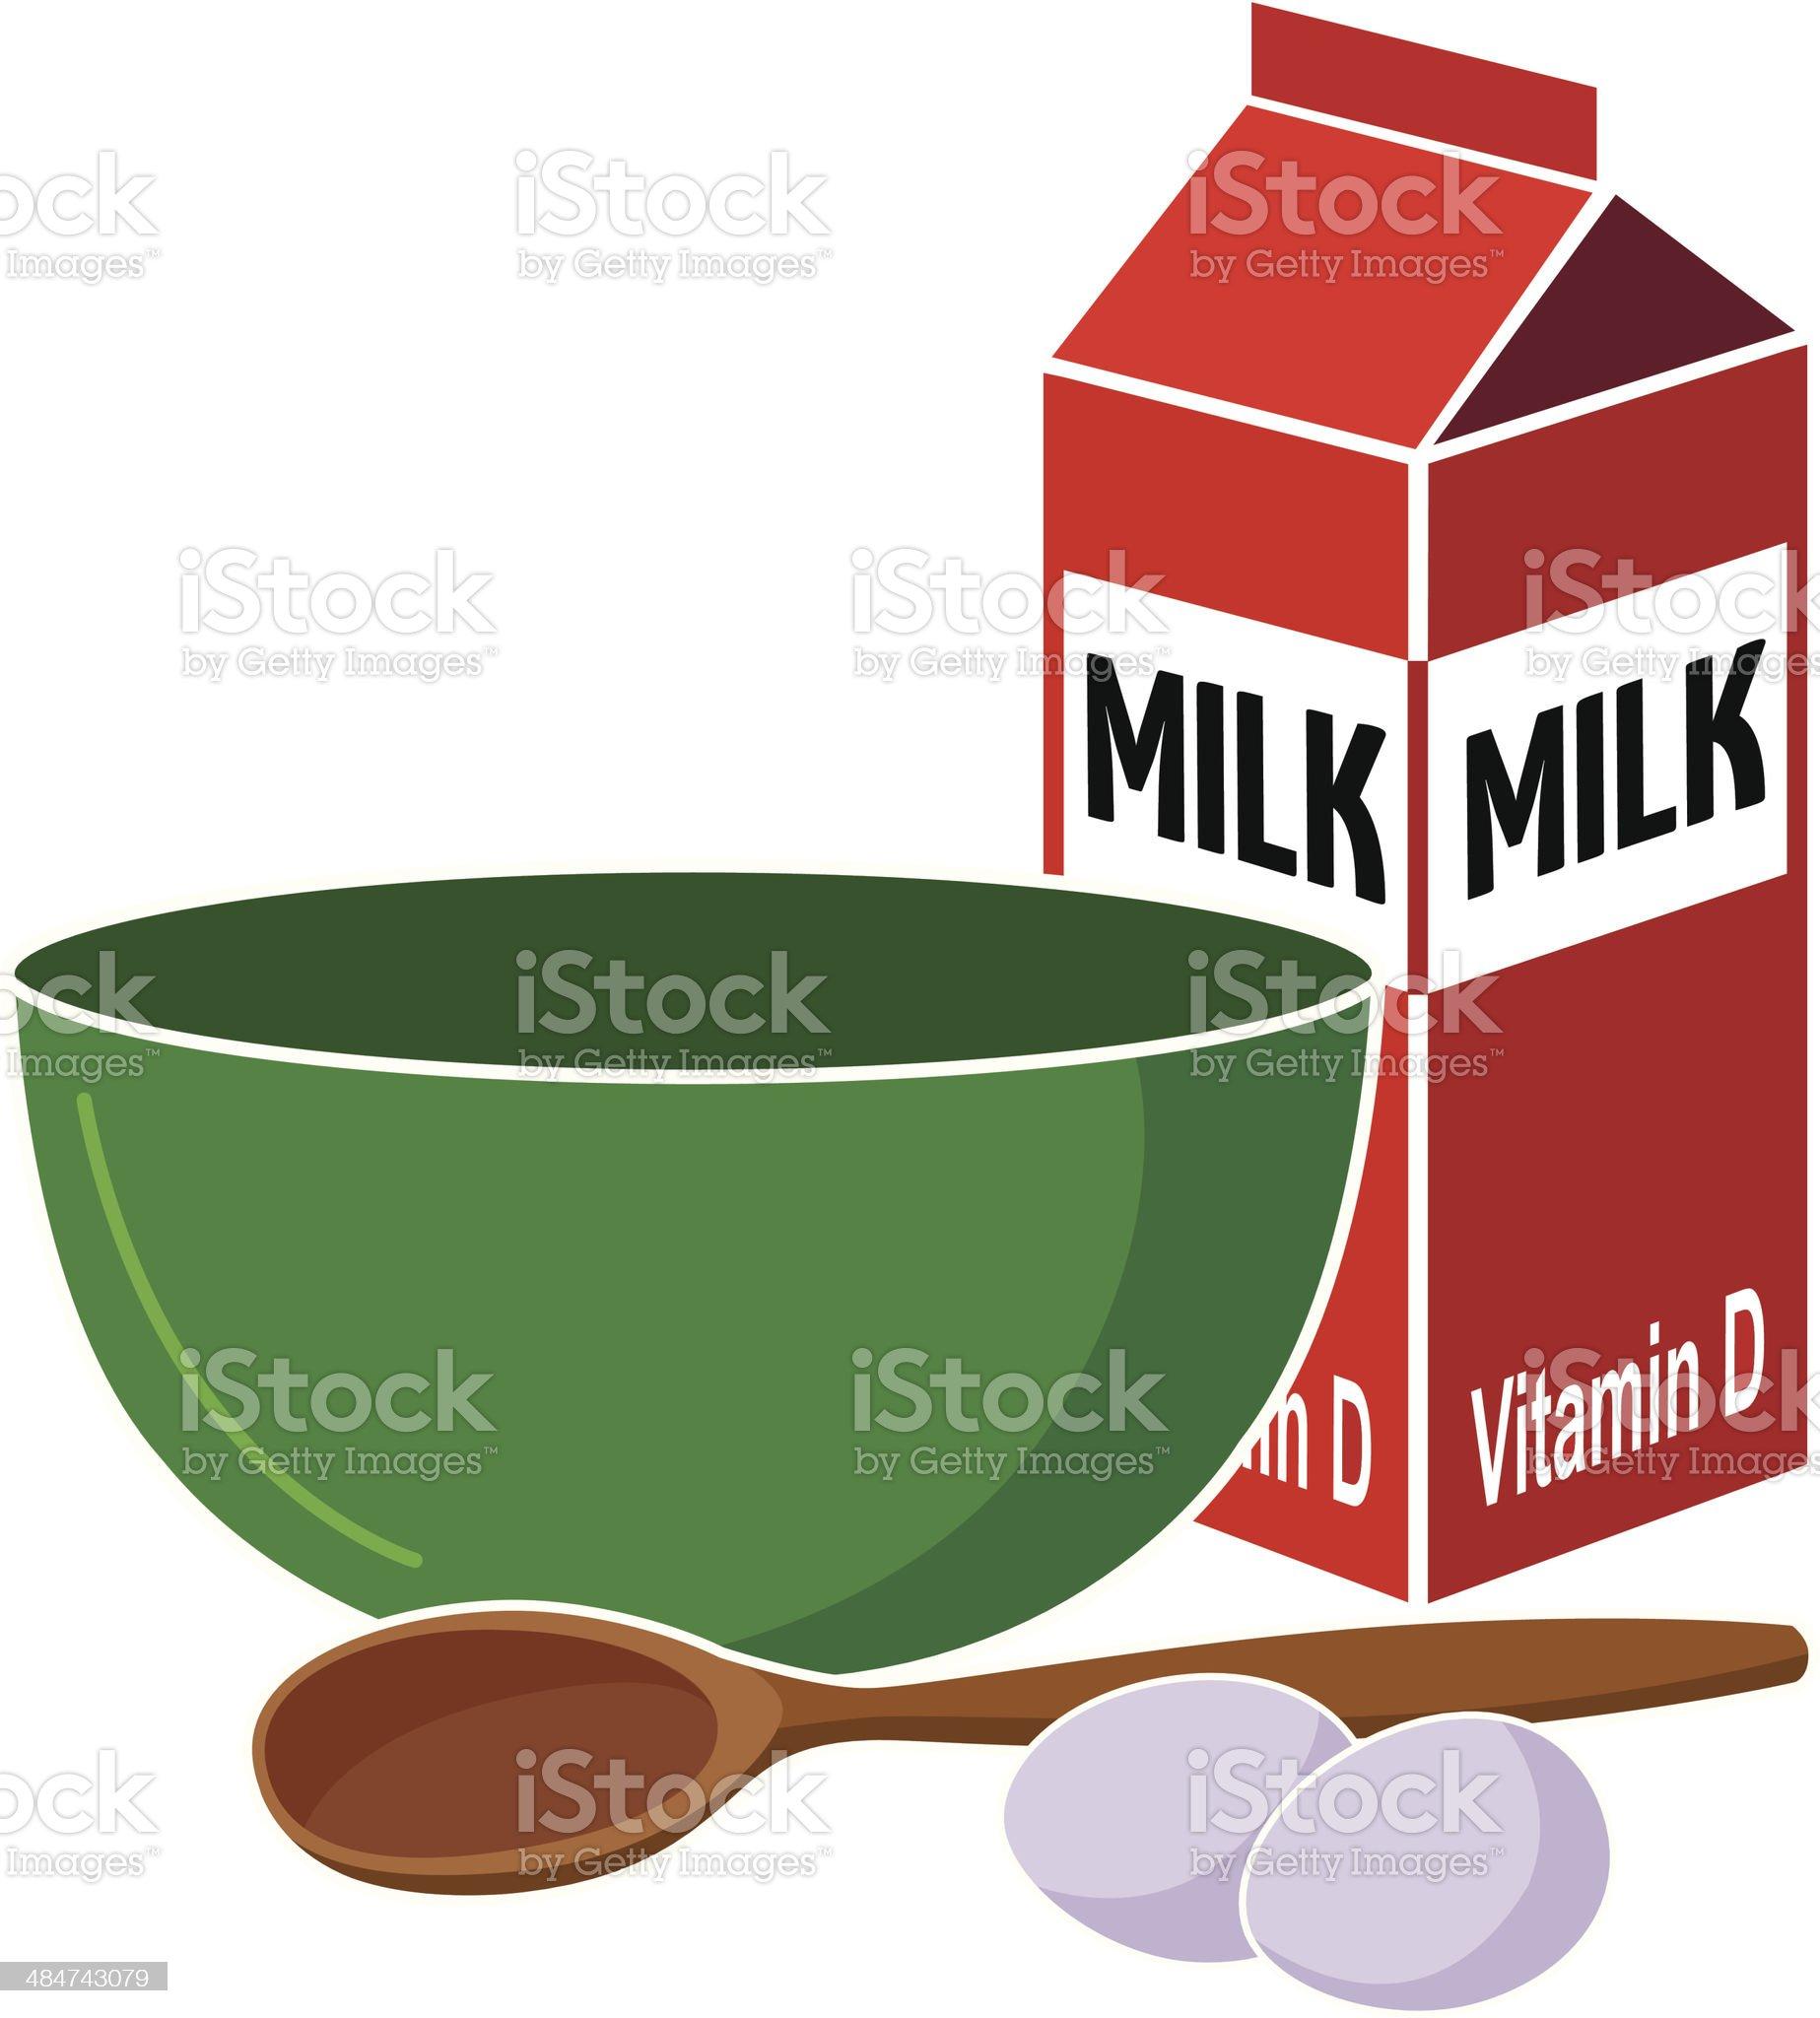 mixing bowl royalty-free stock vector art